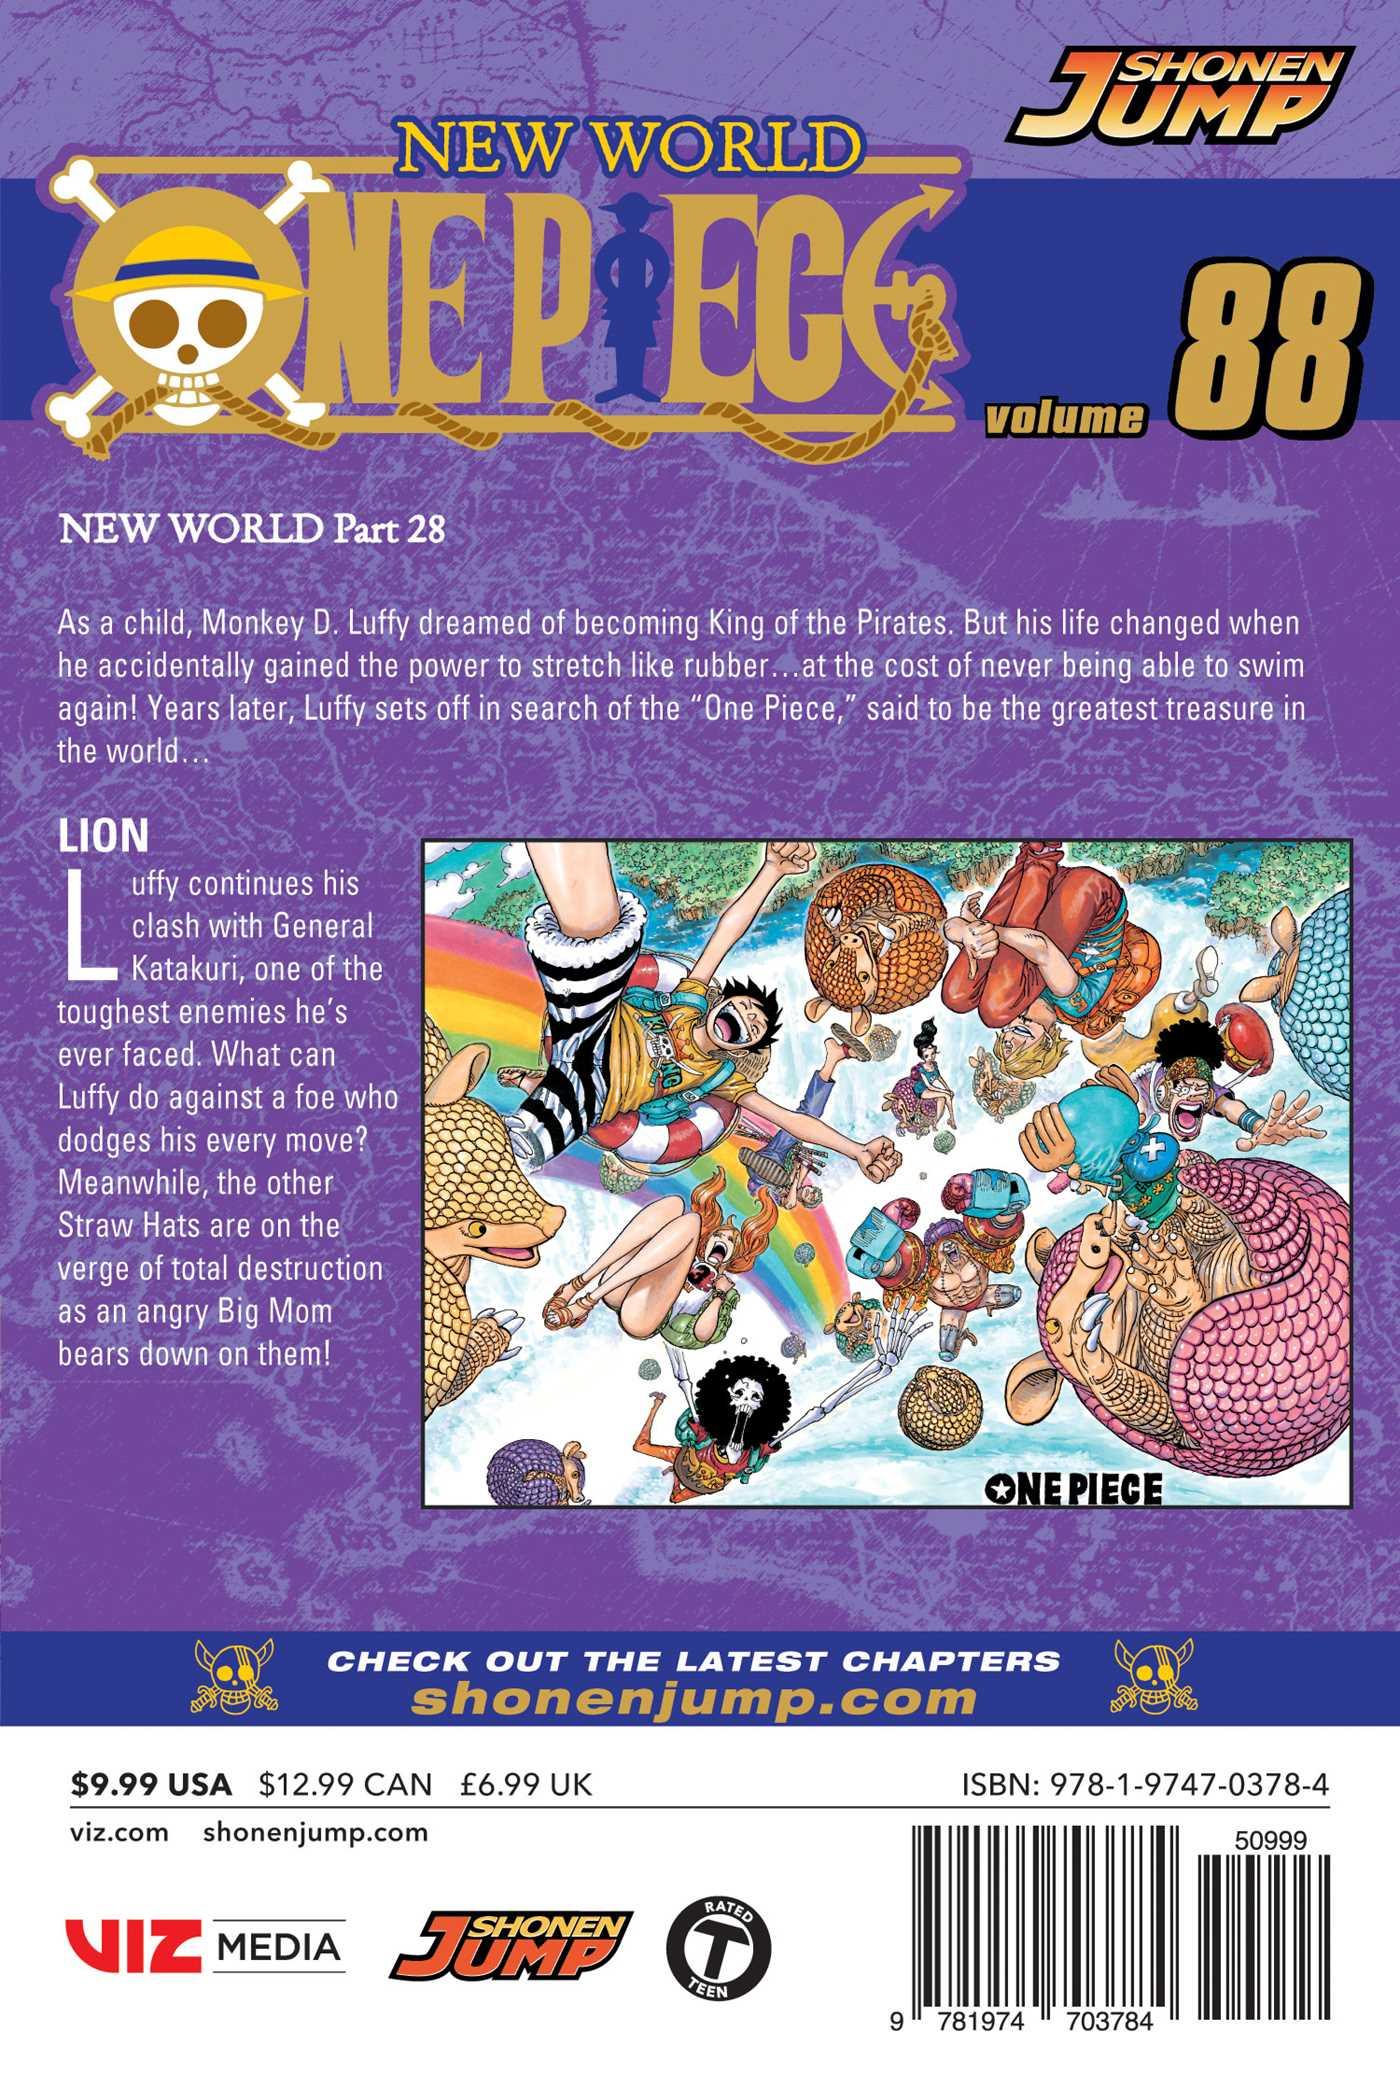 One Piece Manga Volume 88